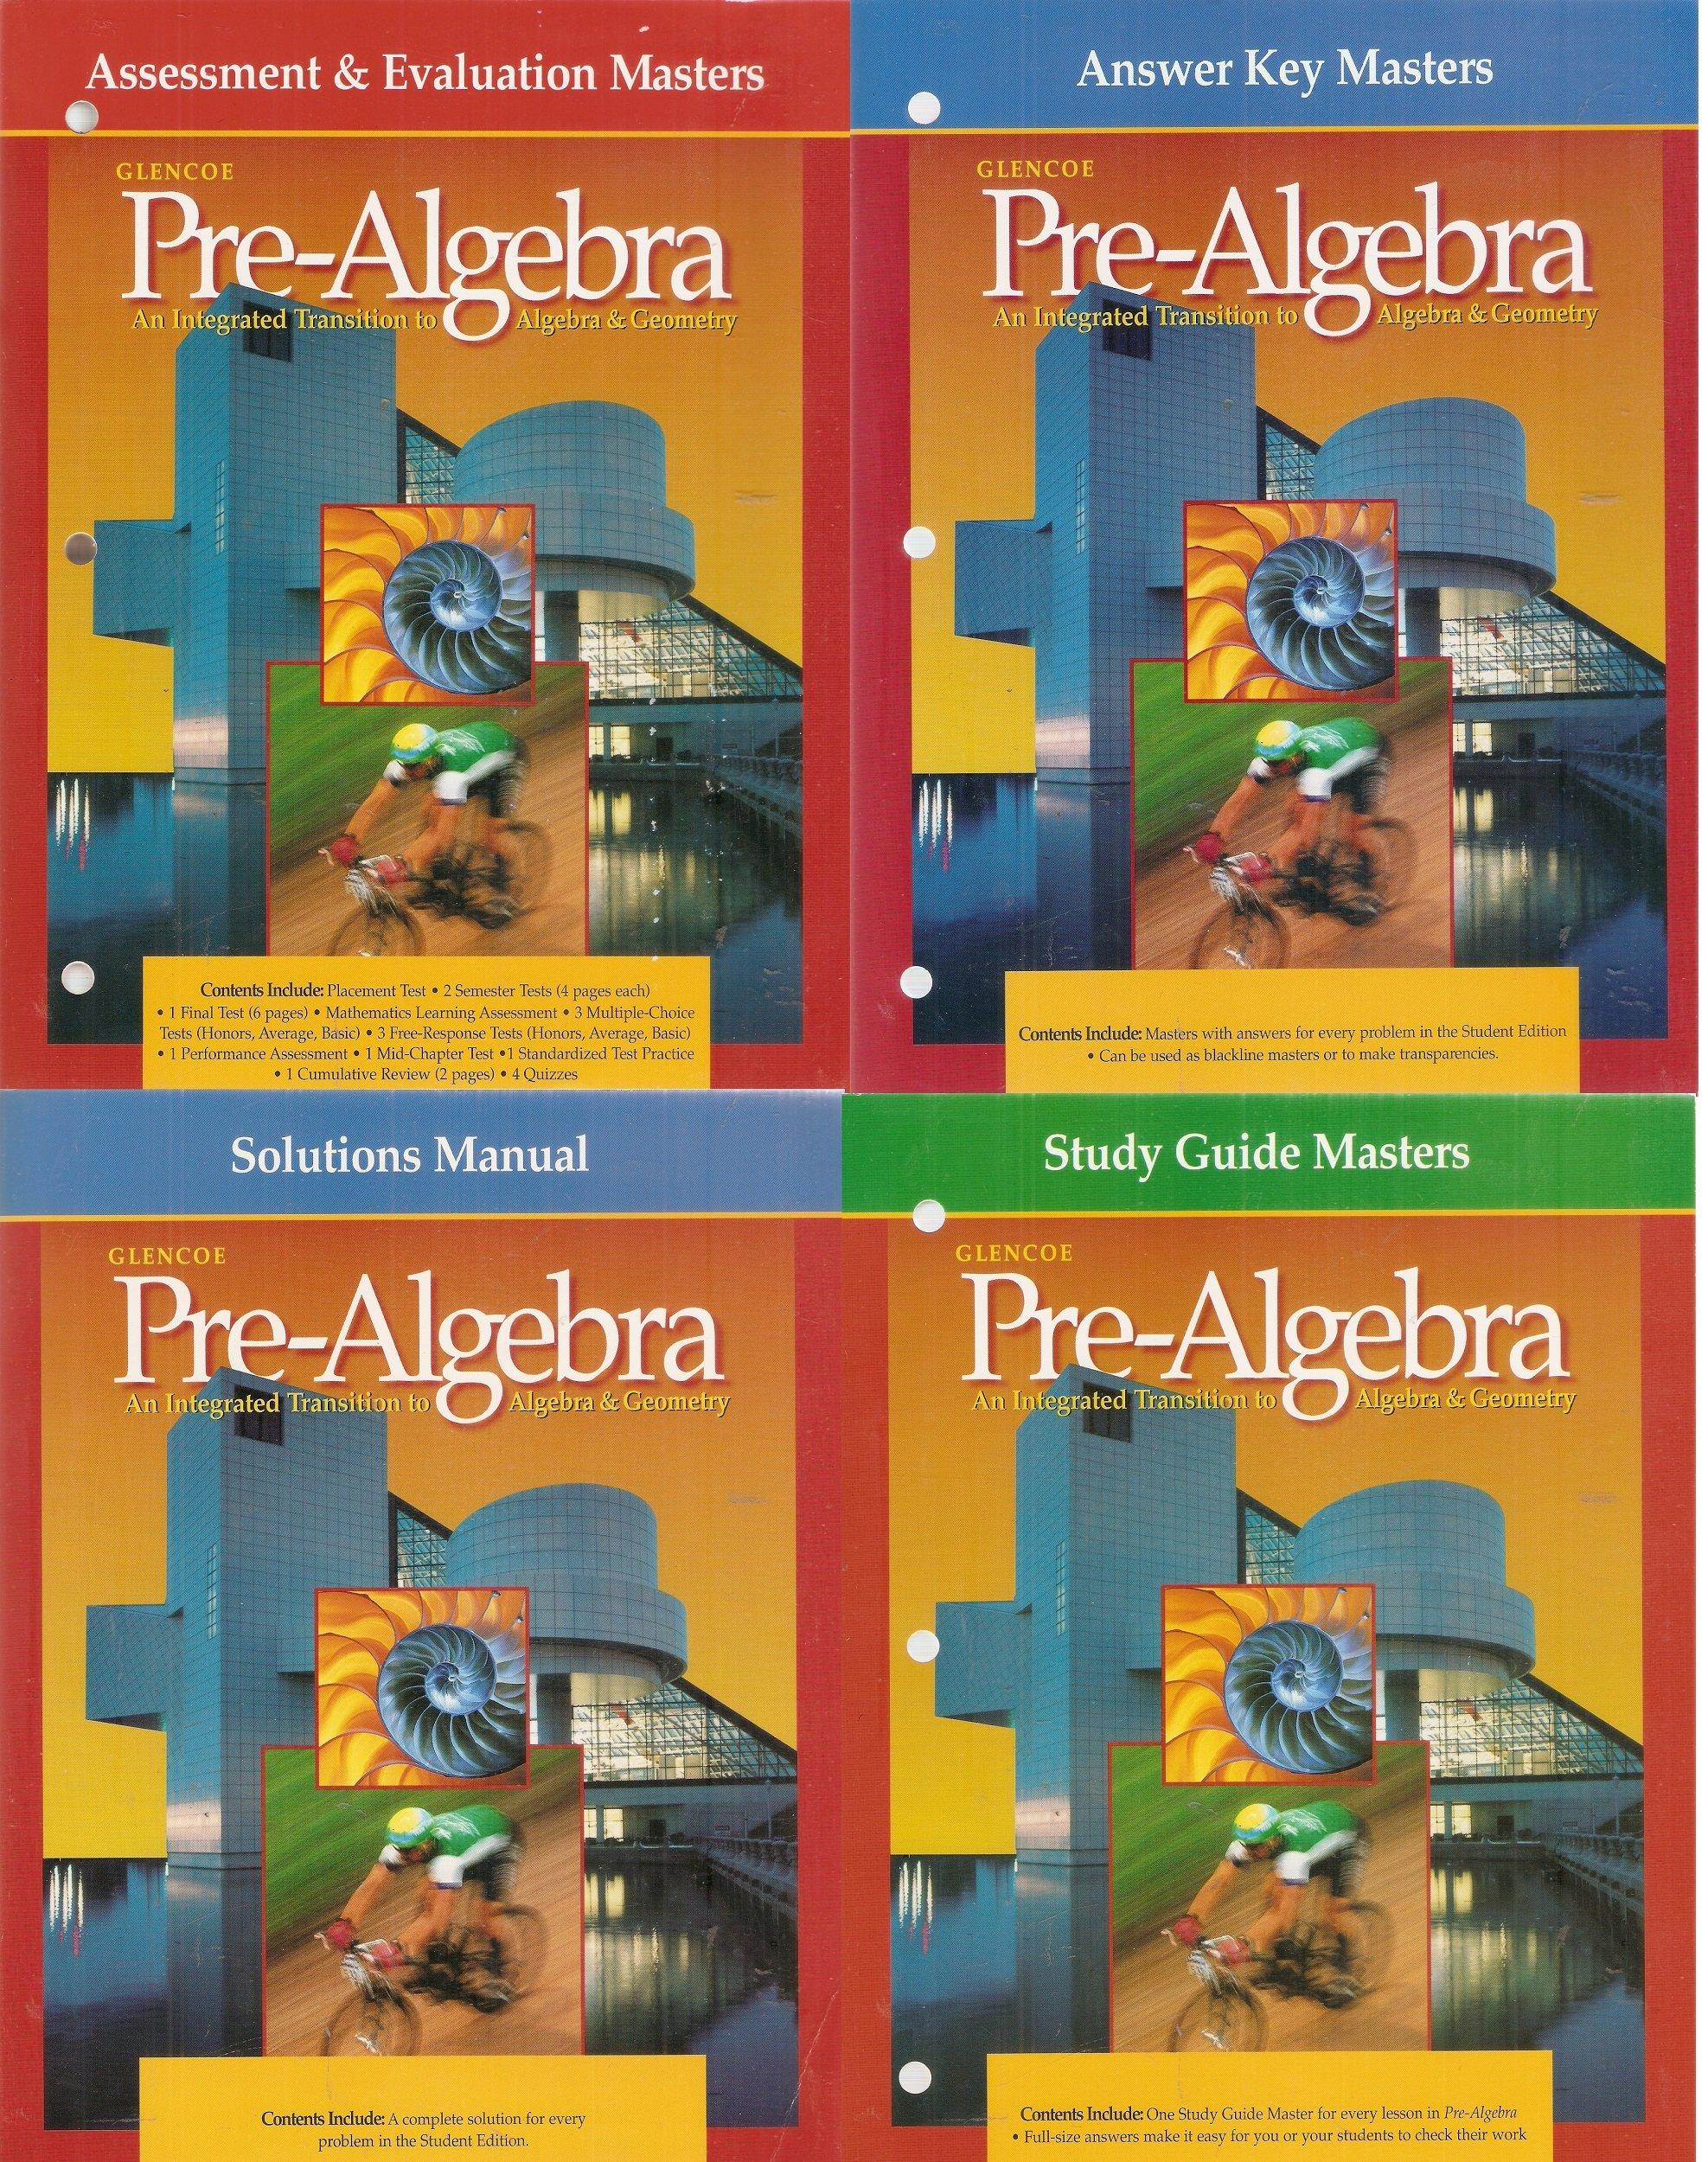 4 Volumes of Glencoe Pre-Algebra: Assessment & Evaluation